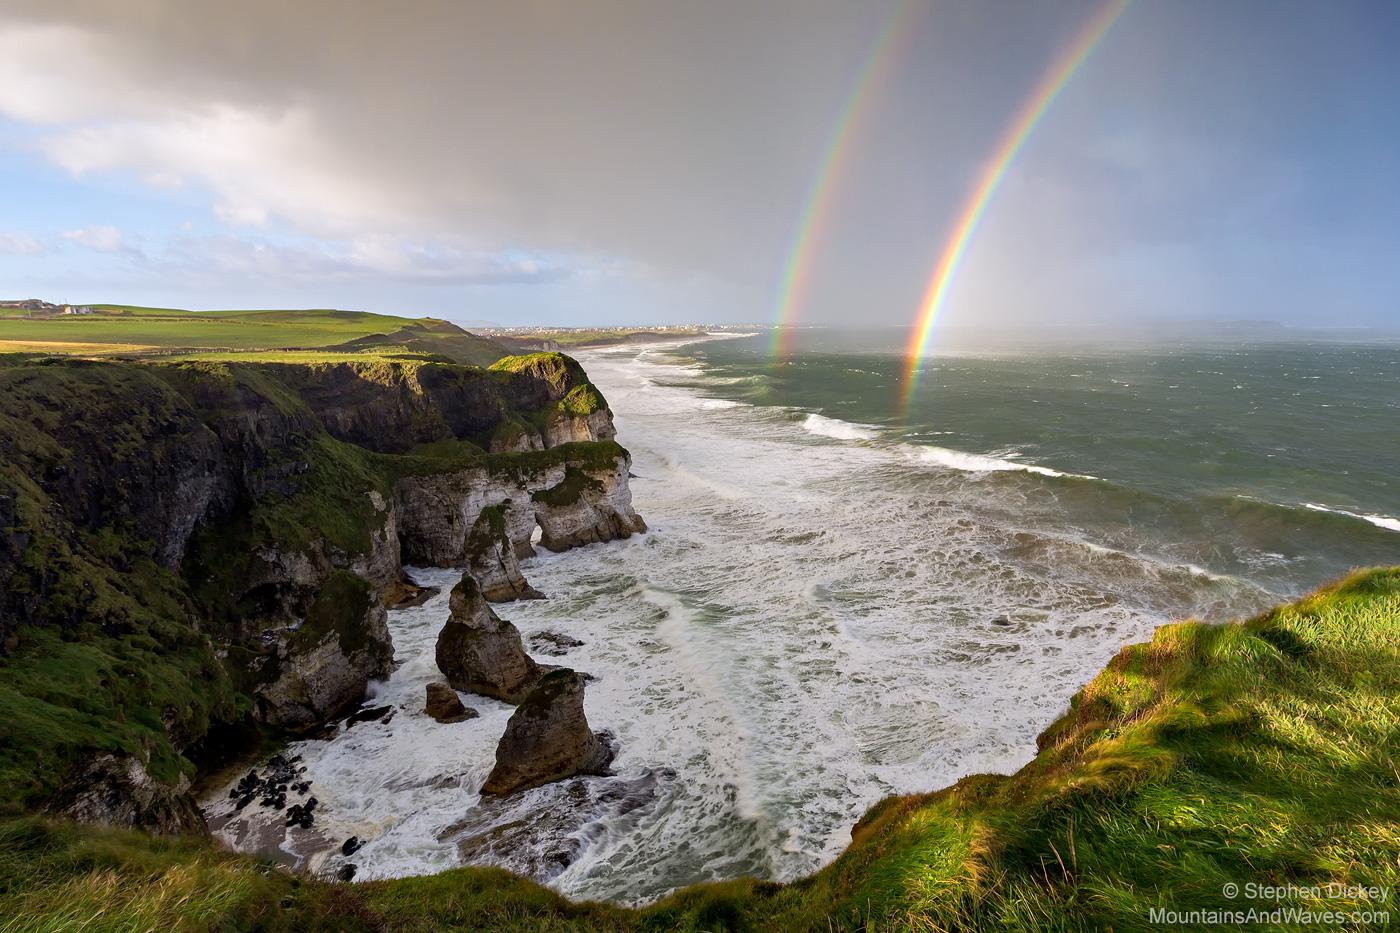 Double Rainbow, Northern Ireland